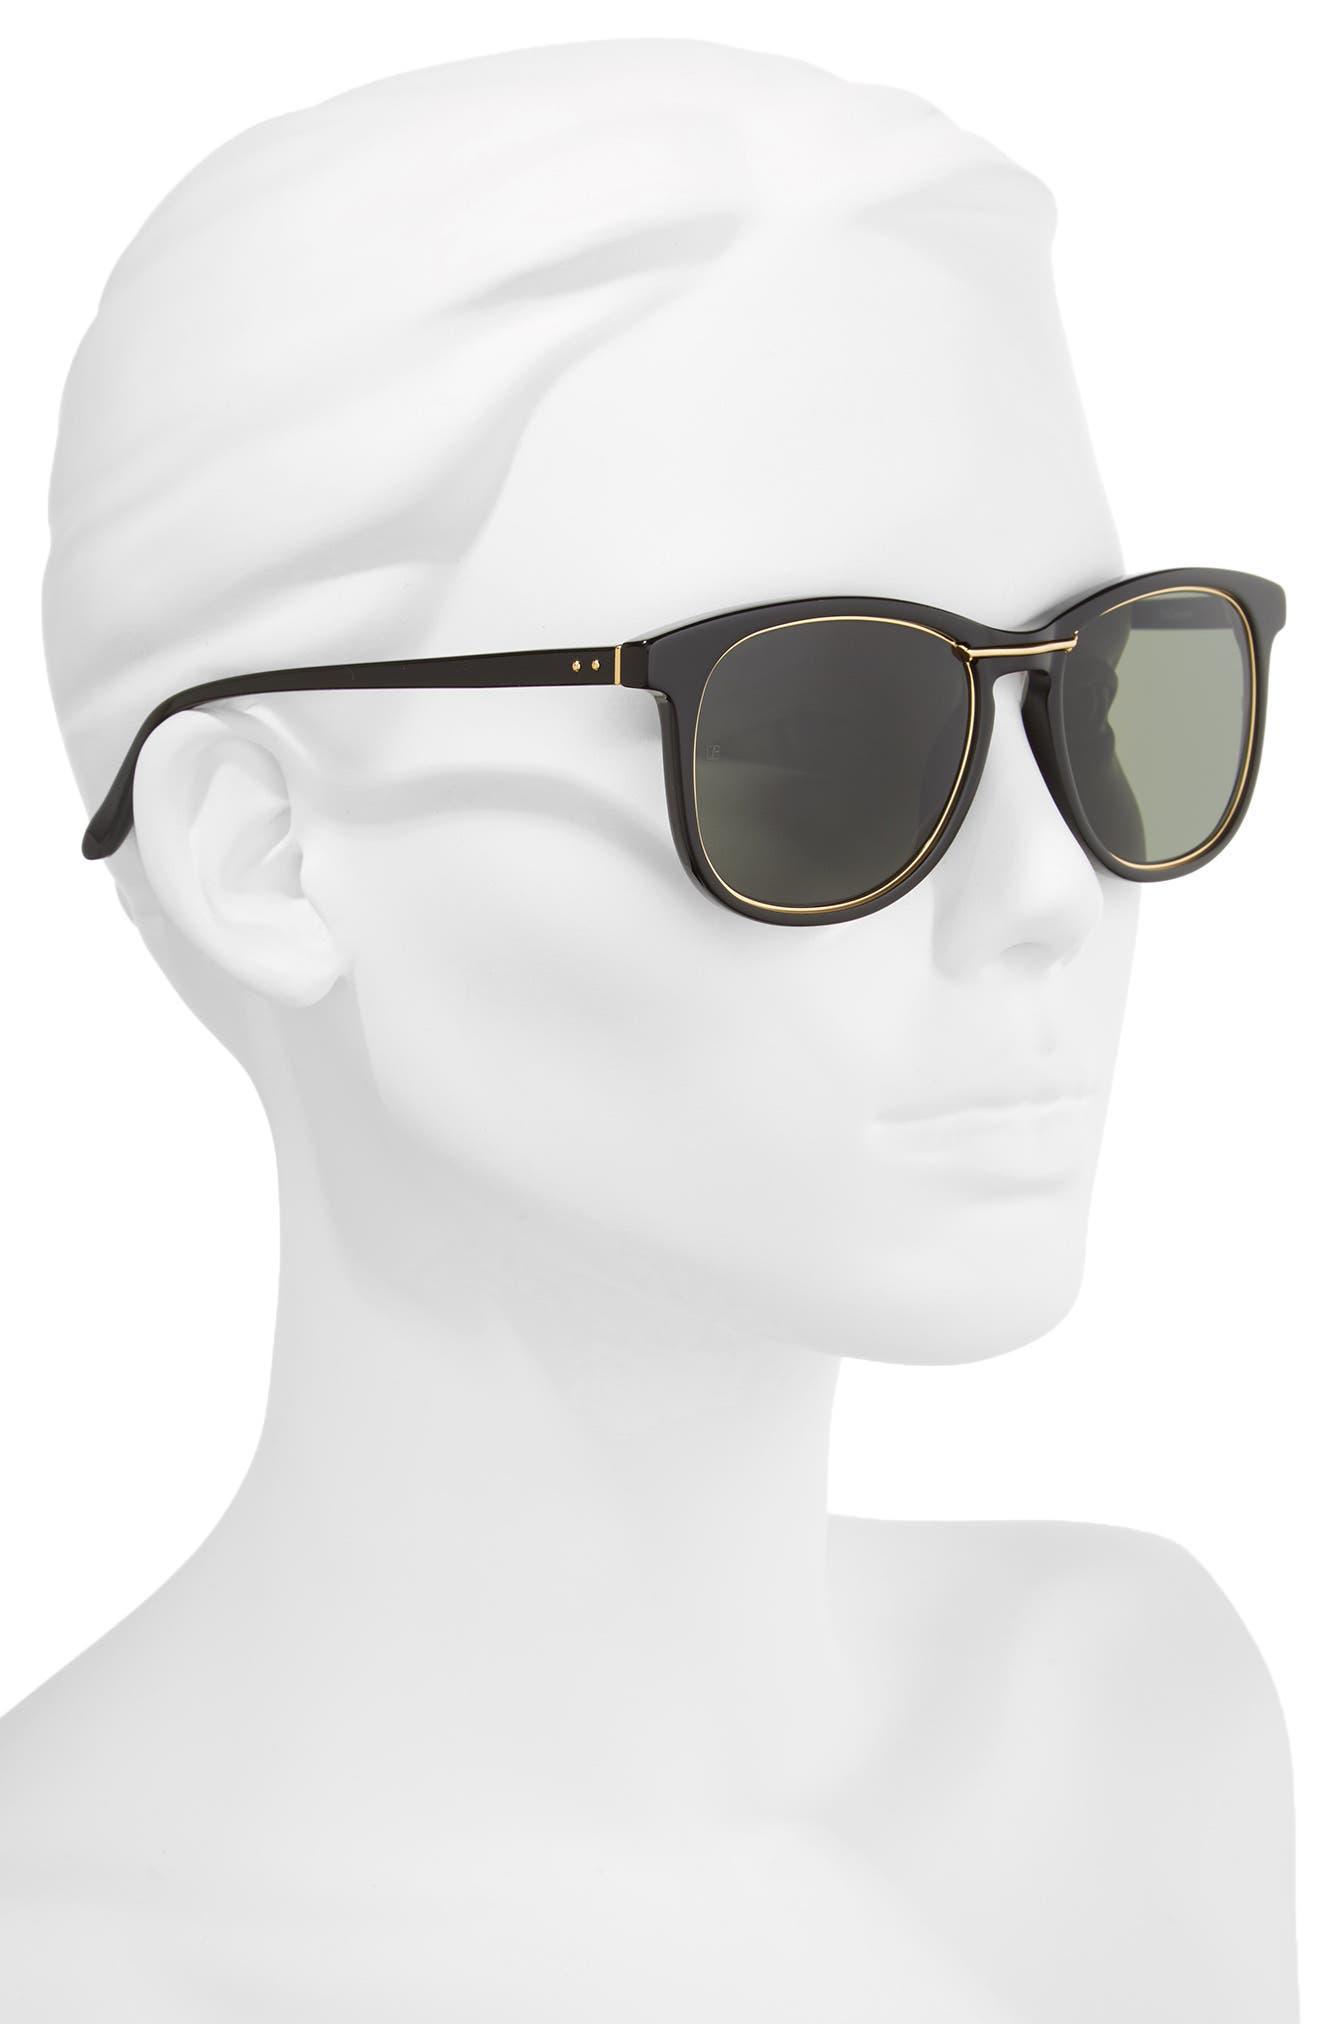 53mm Sunglasses,                             Alternate thumbnail 3, color,                             Wilmott Black/ Yellow Gold